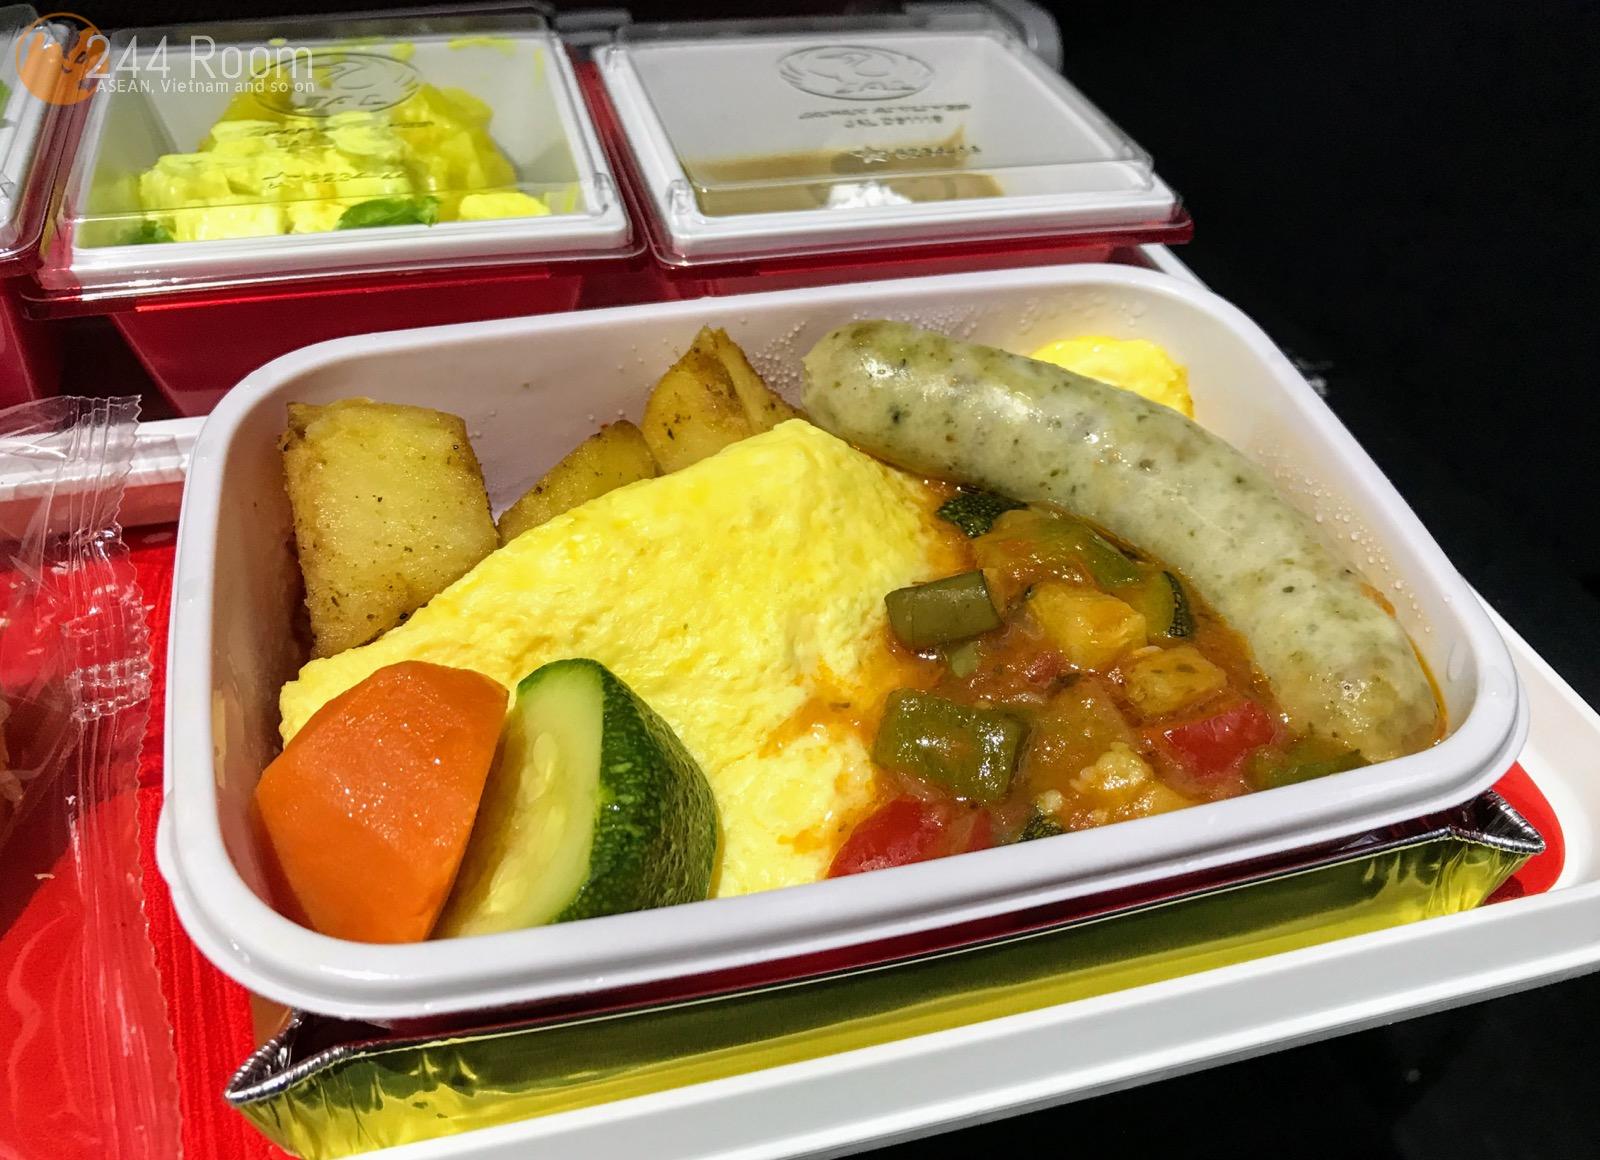 JALエコノミークラス機内食 JAL Economyclass-flight-meal3